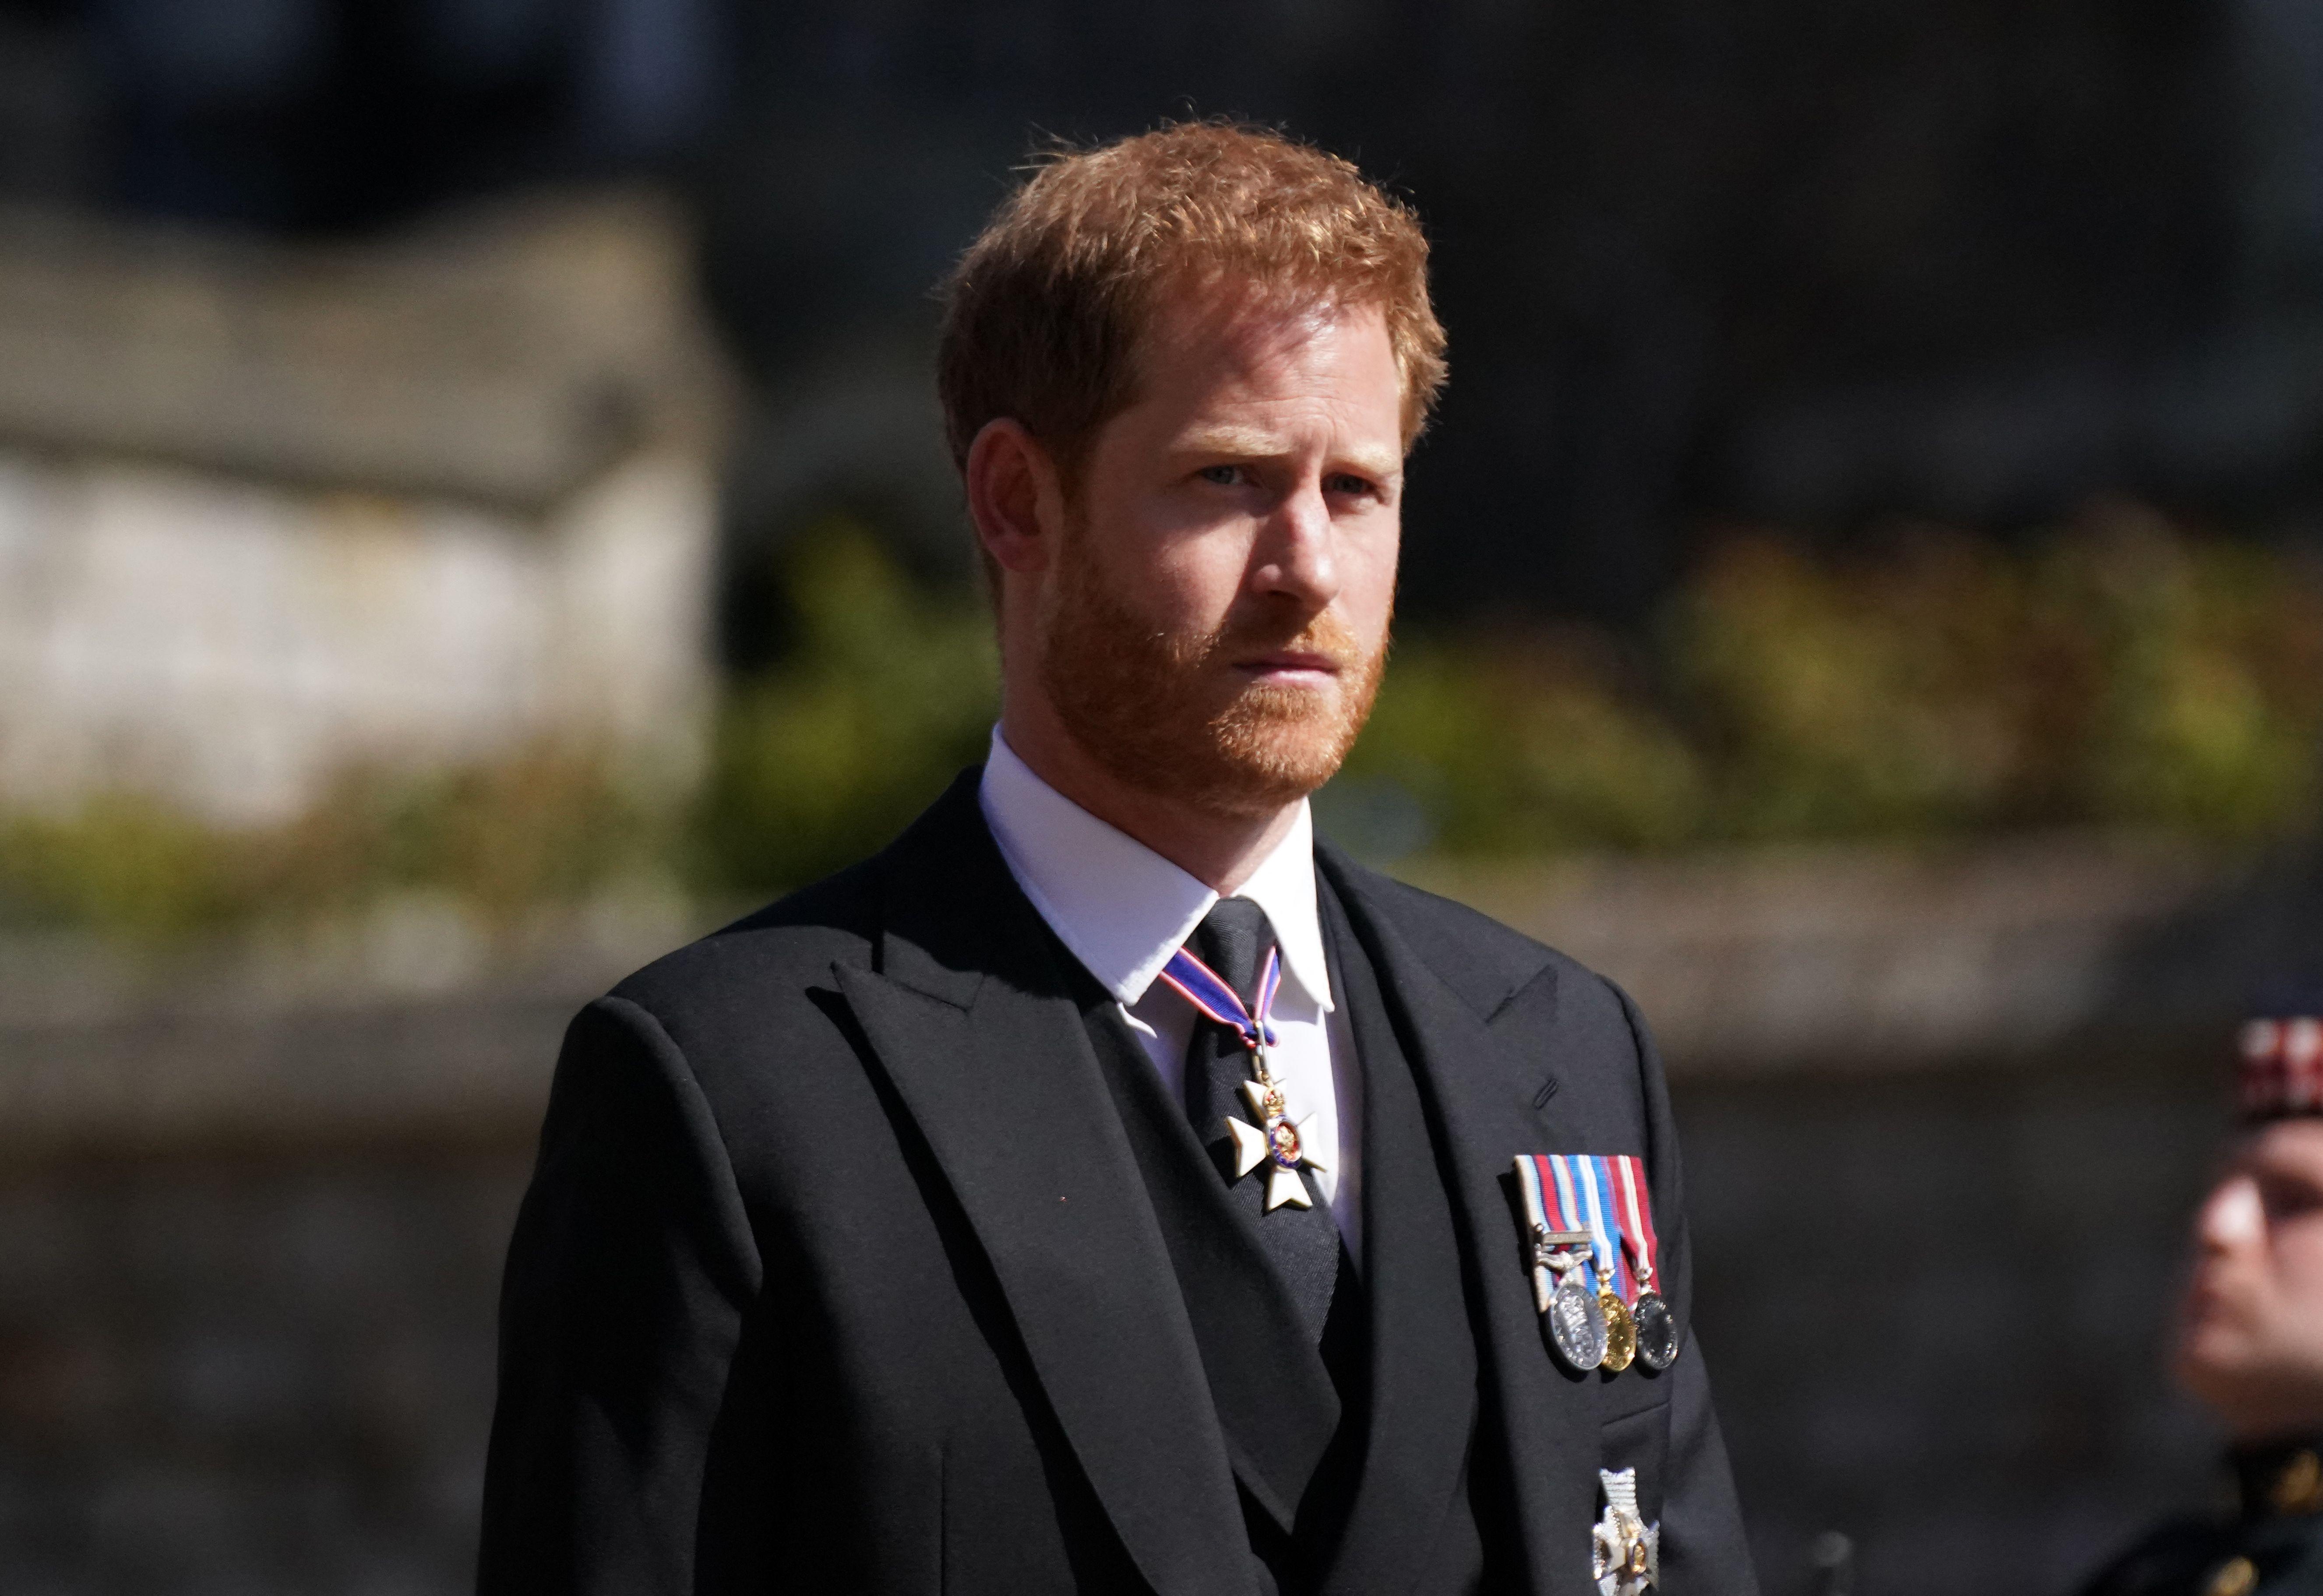 Prince Harry Has Returned to the United Kingdom